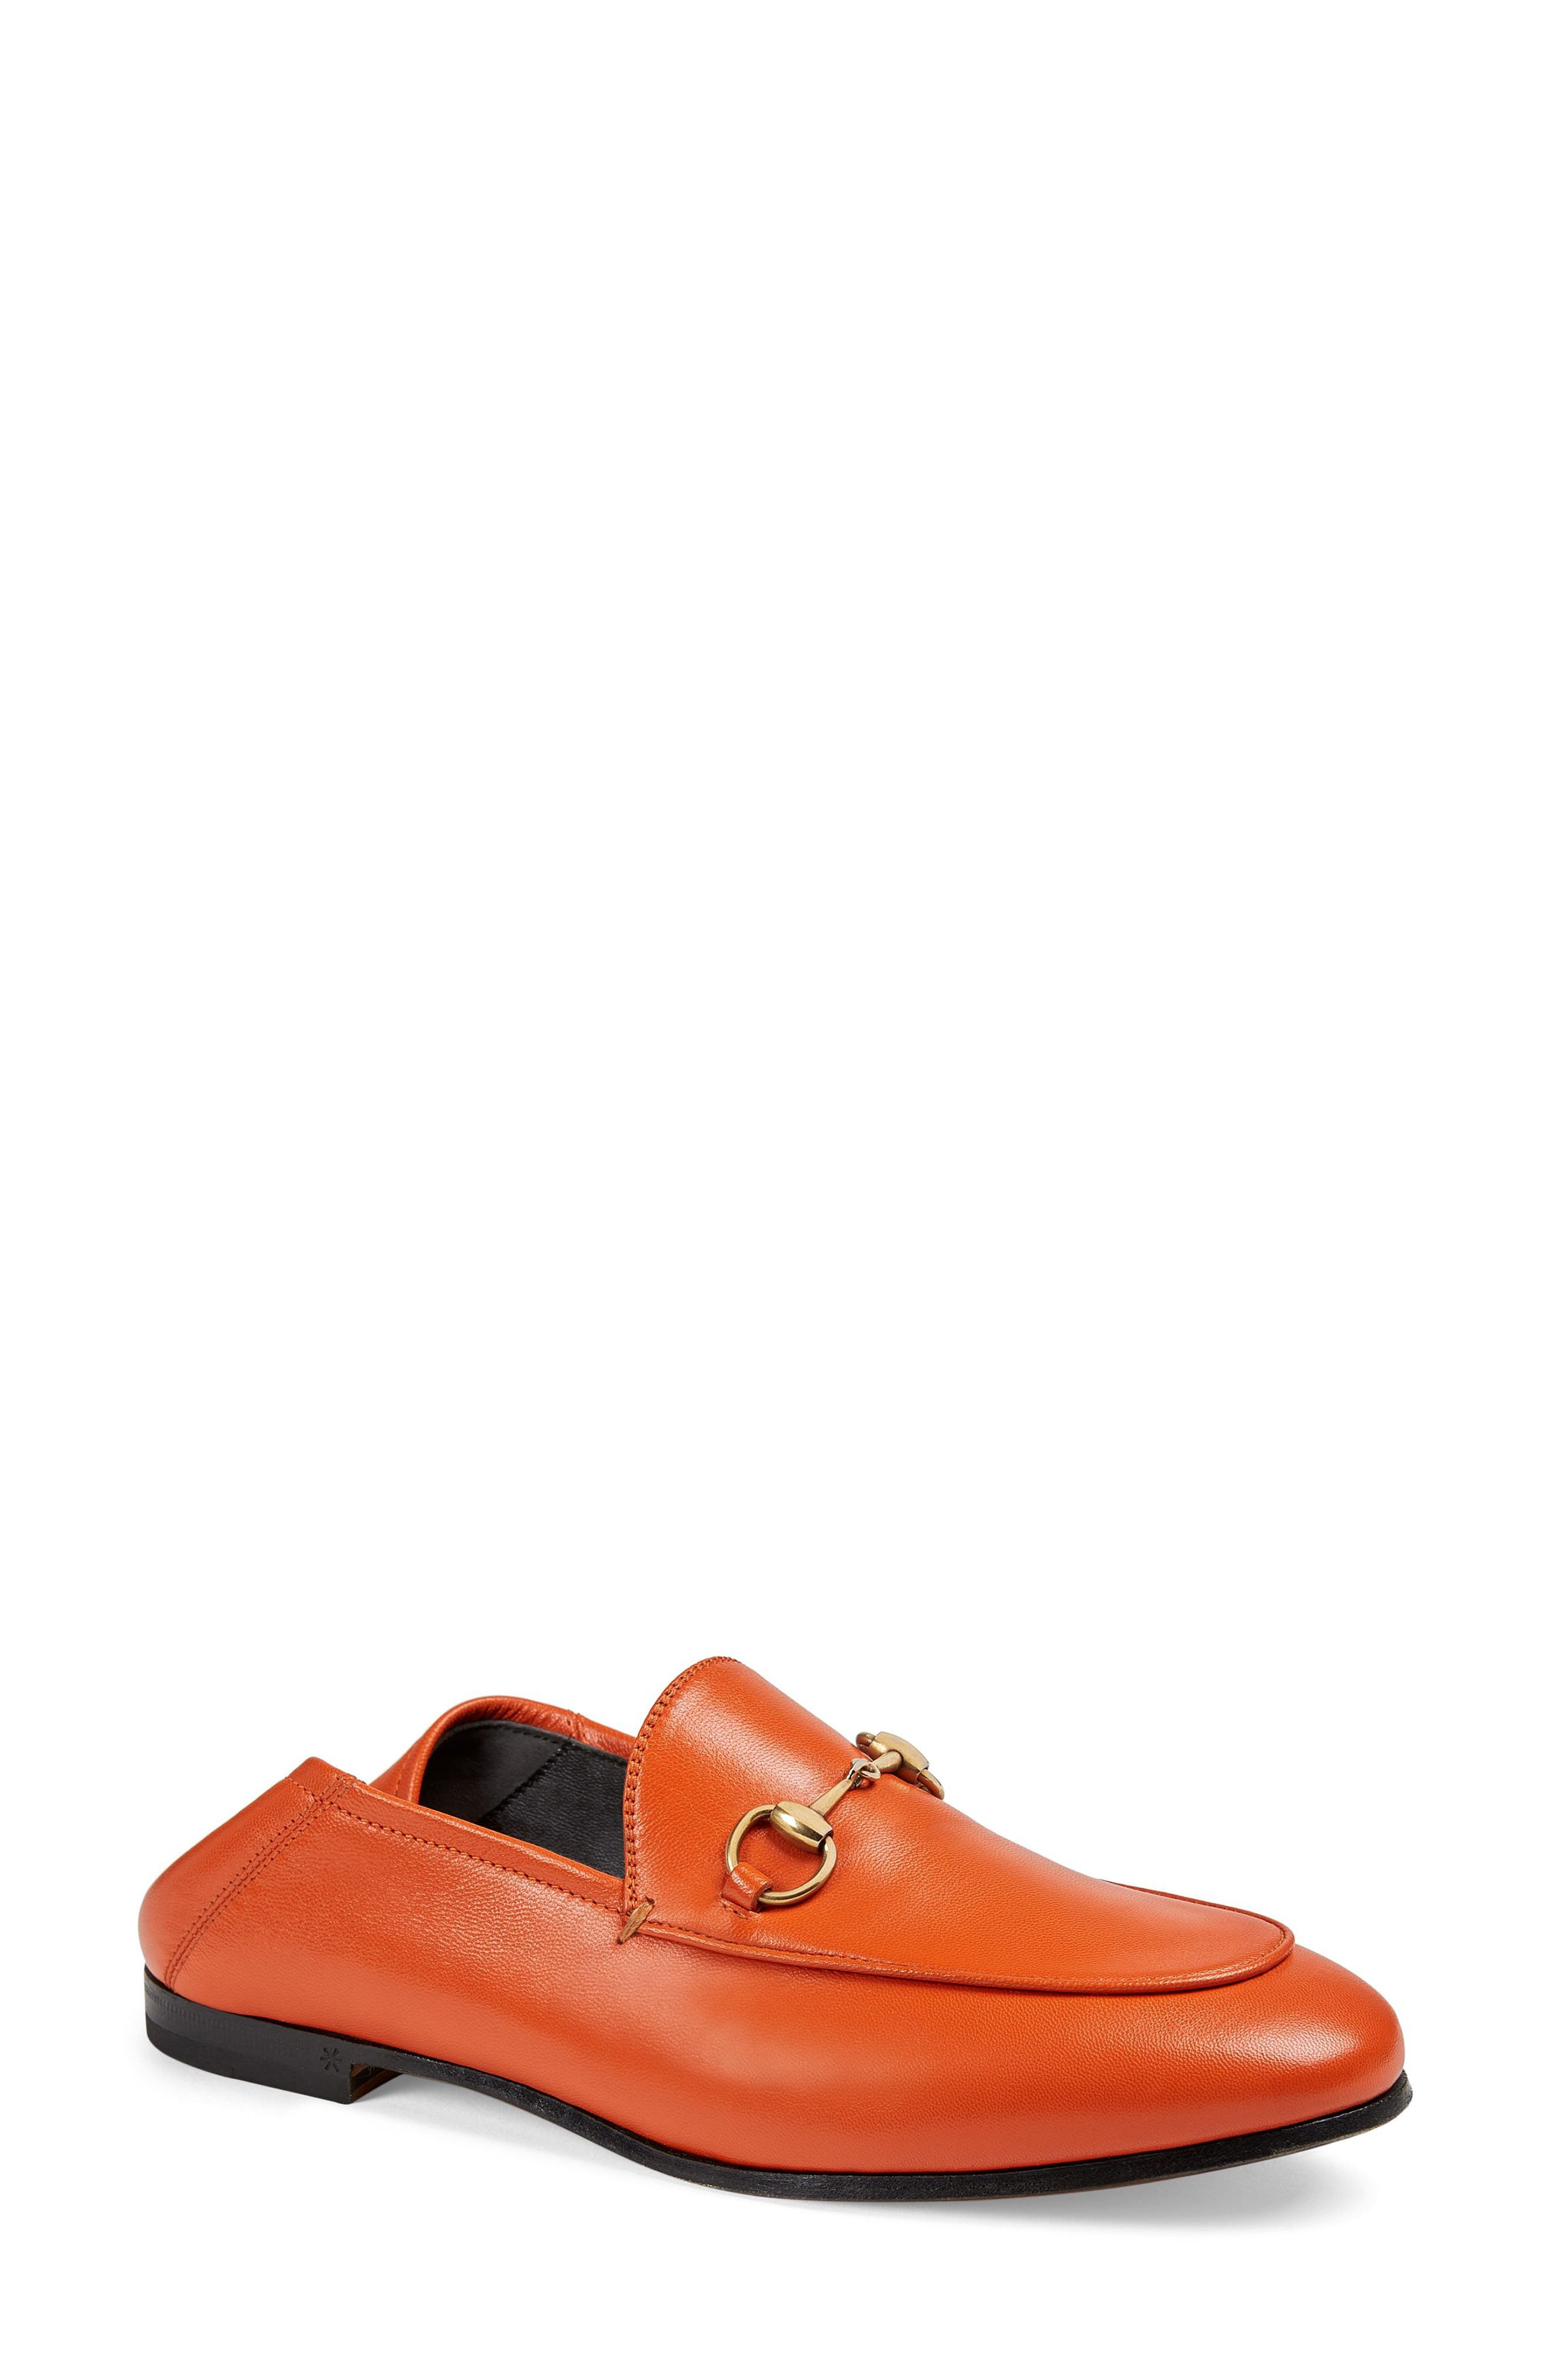 Brixton Convertible Loafer,                             Main thumbnail 1, color,                             DEEP ORANGE